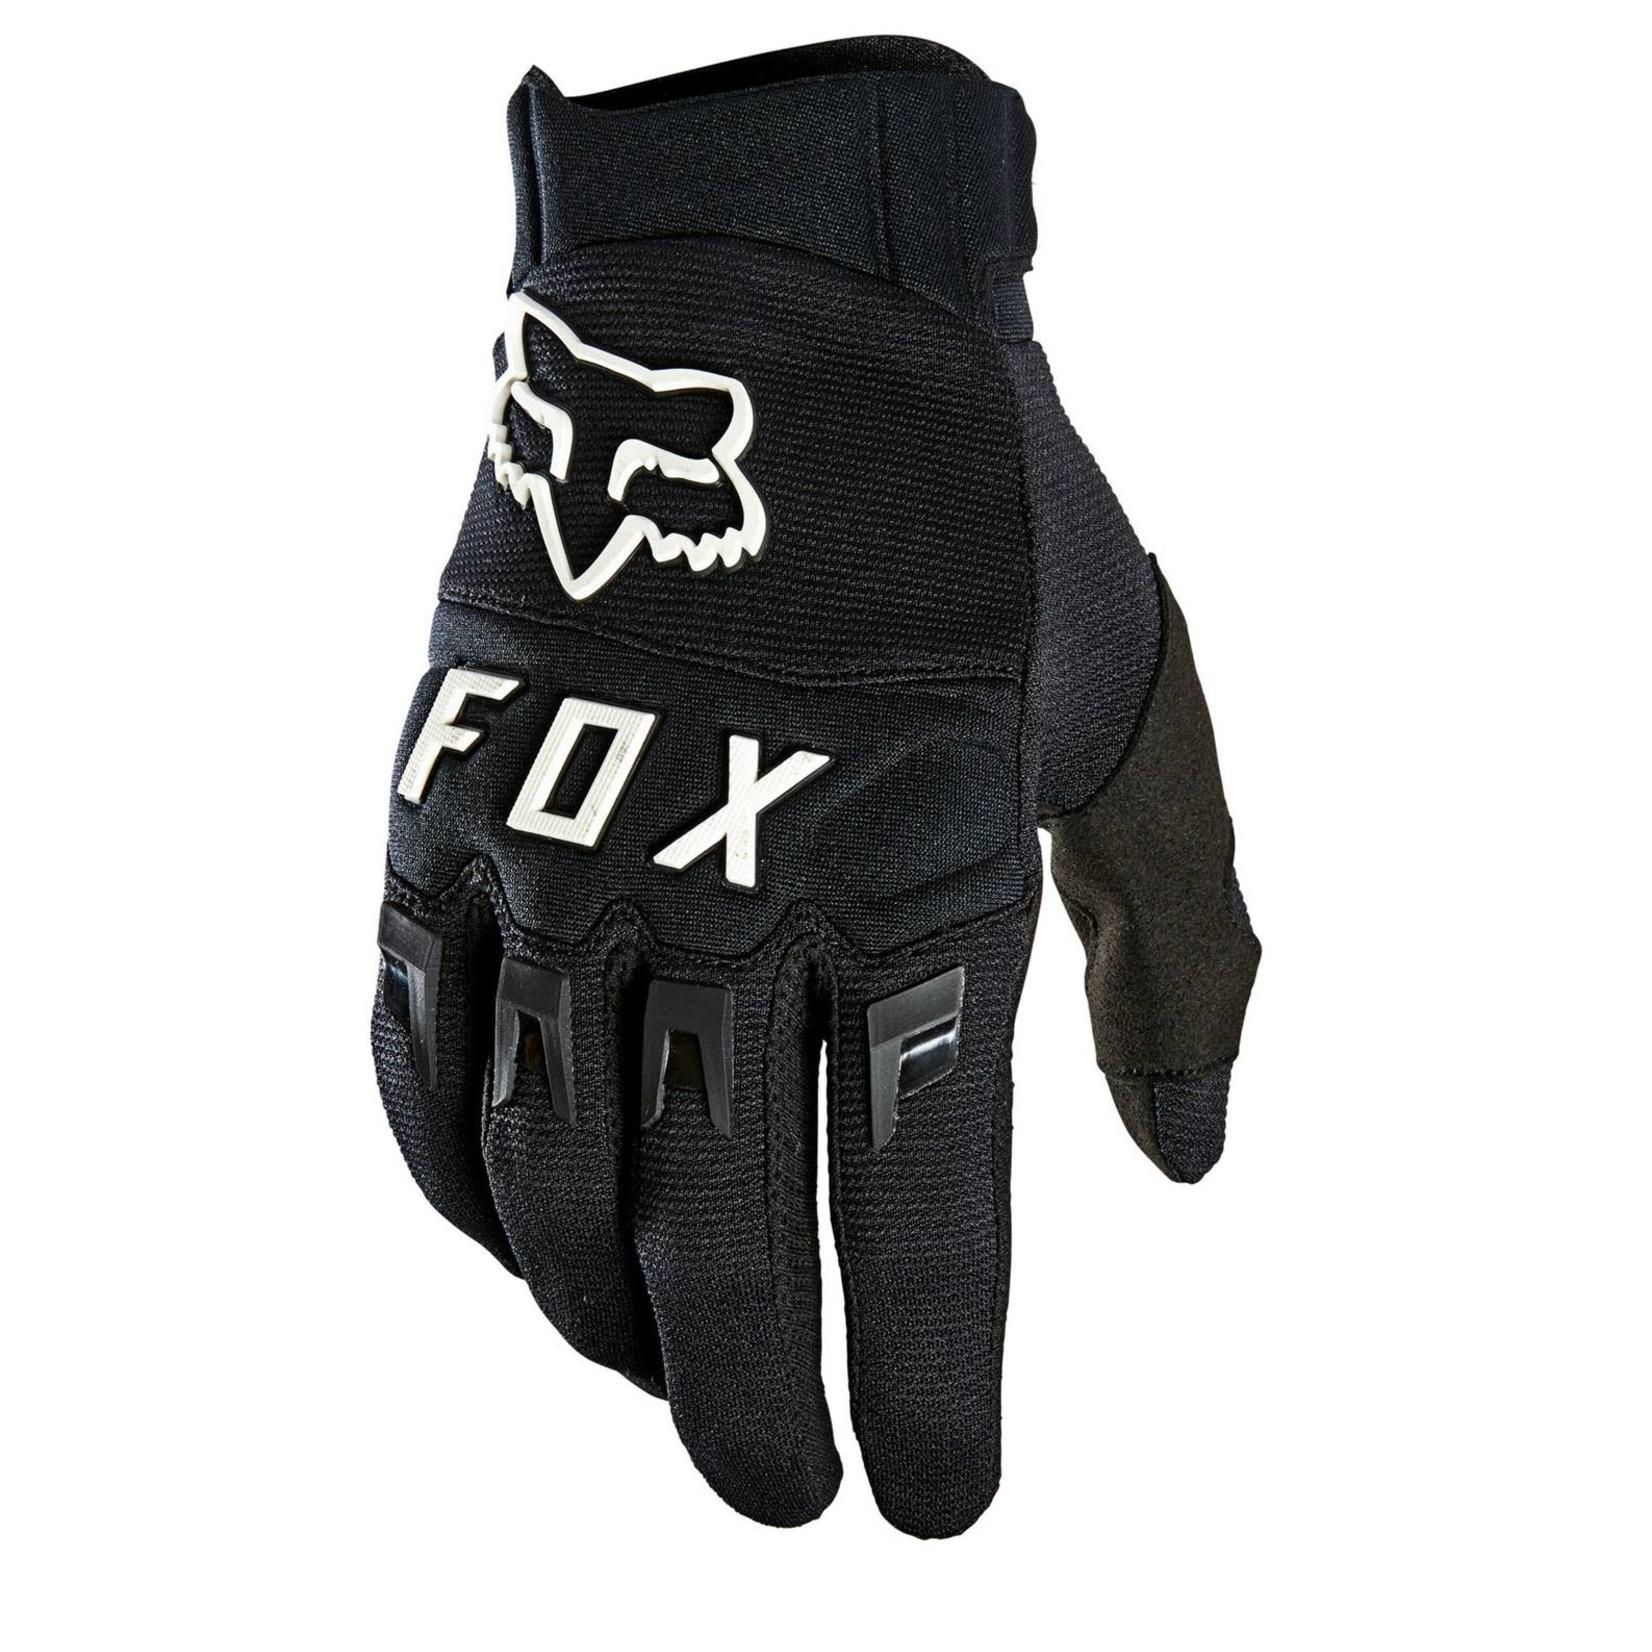 Fox Dirtpaw Mountain Bike Glove Black/White